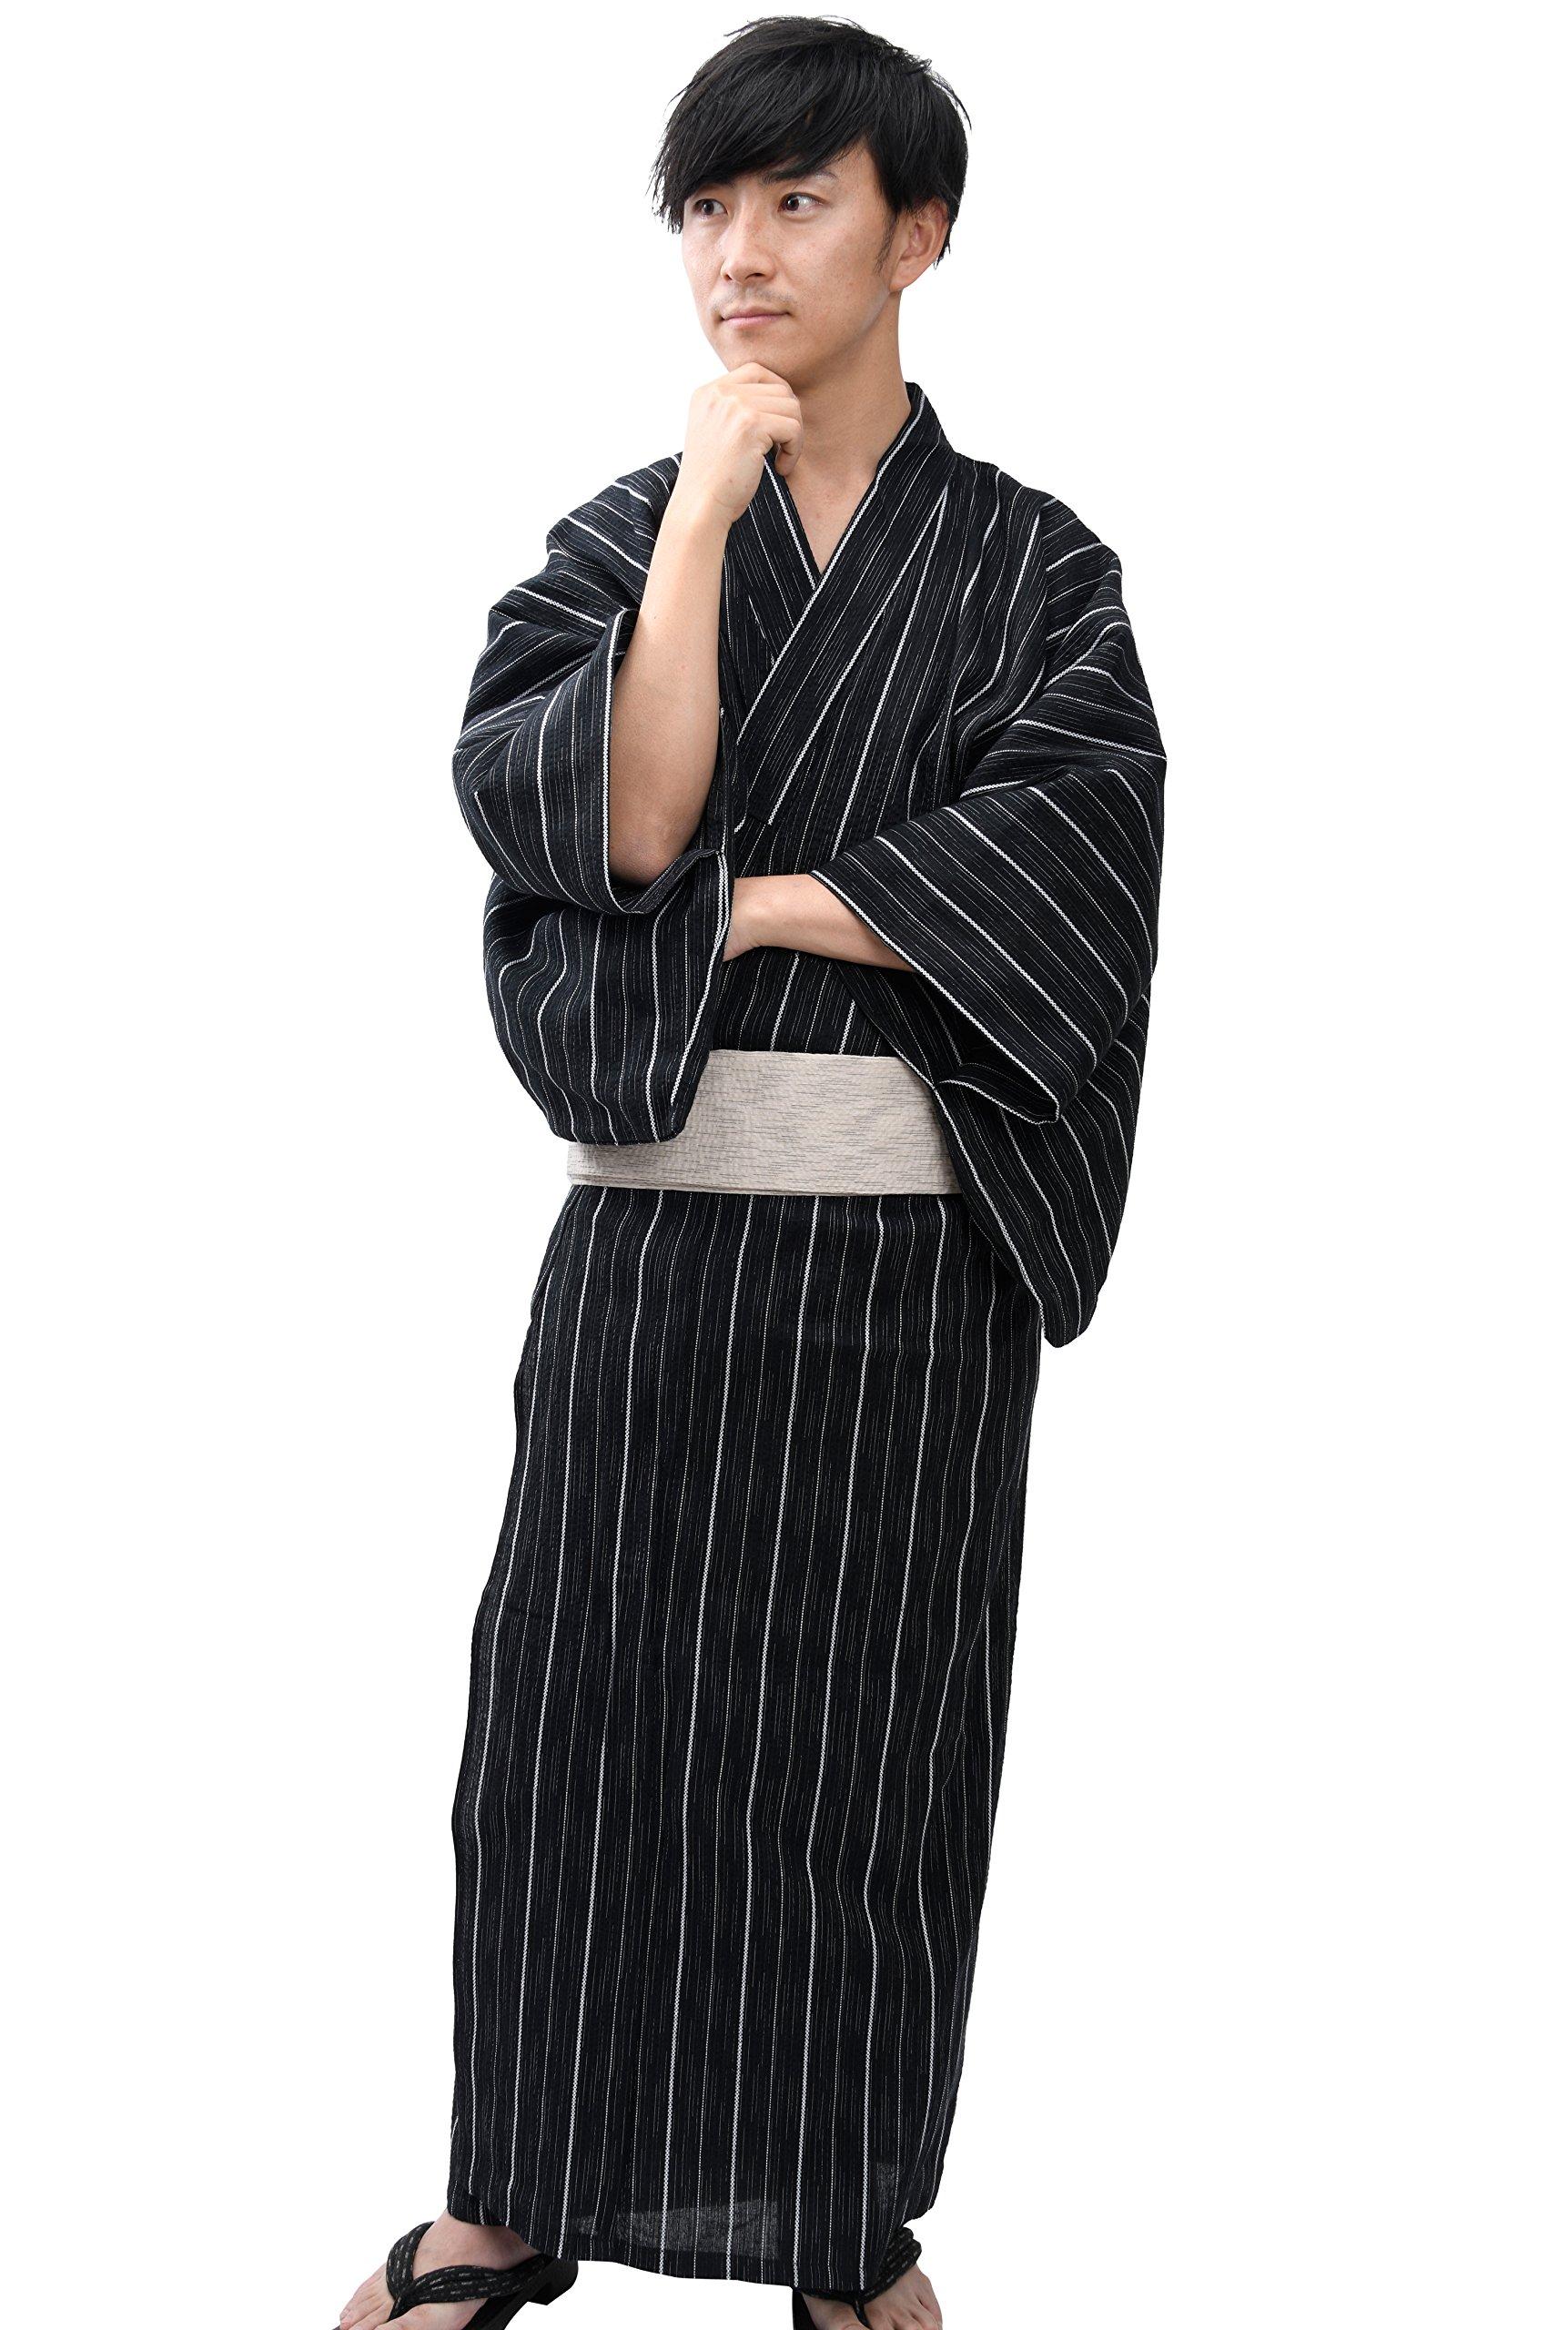 Edoten Men's Kimono Japan Shijira Weaving Yukata 701 Black Stripe M